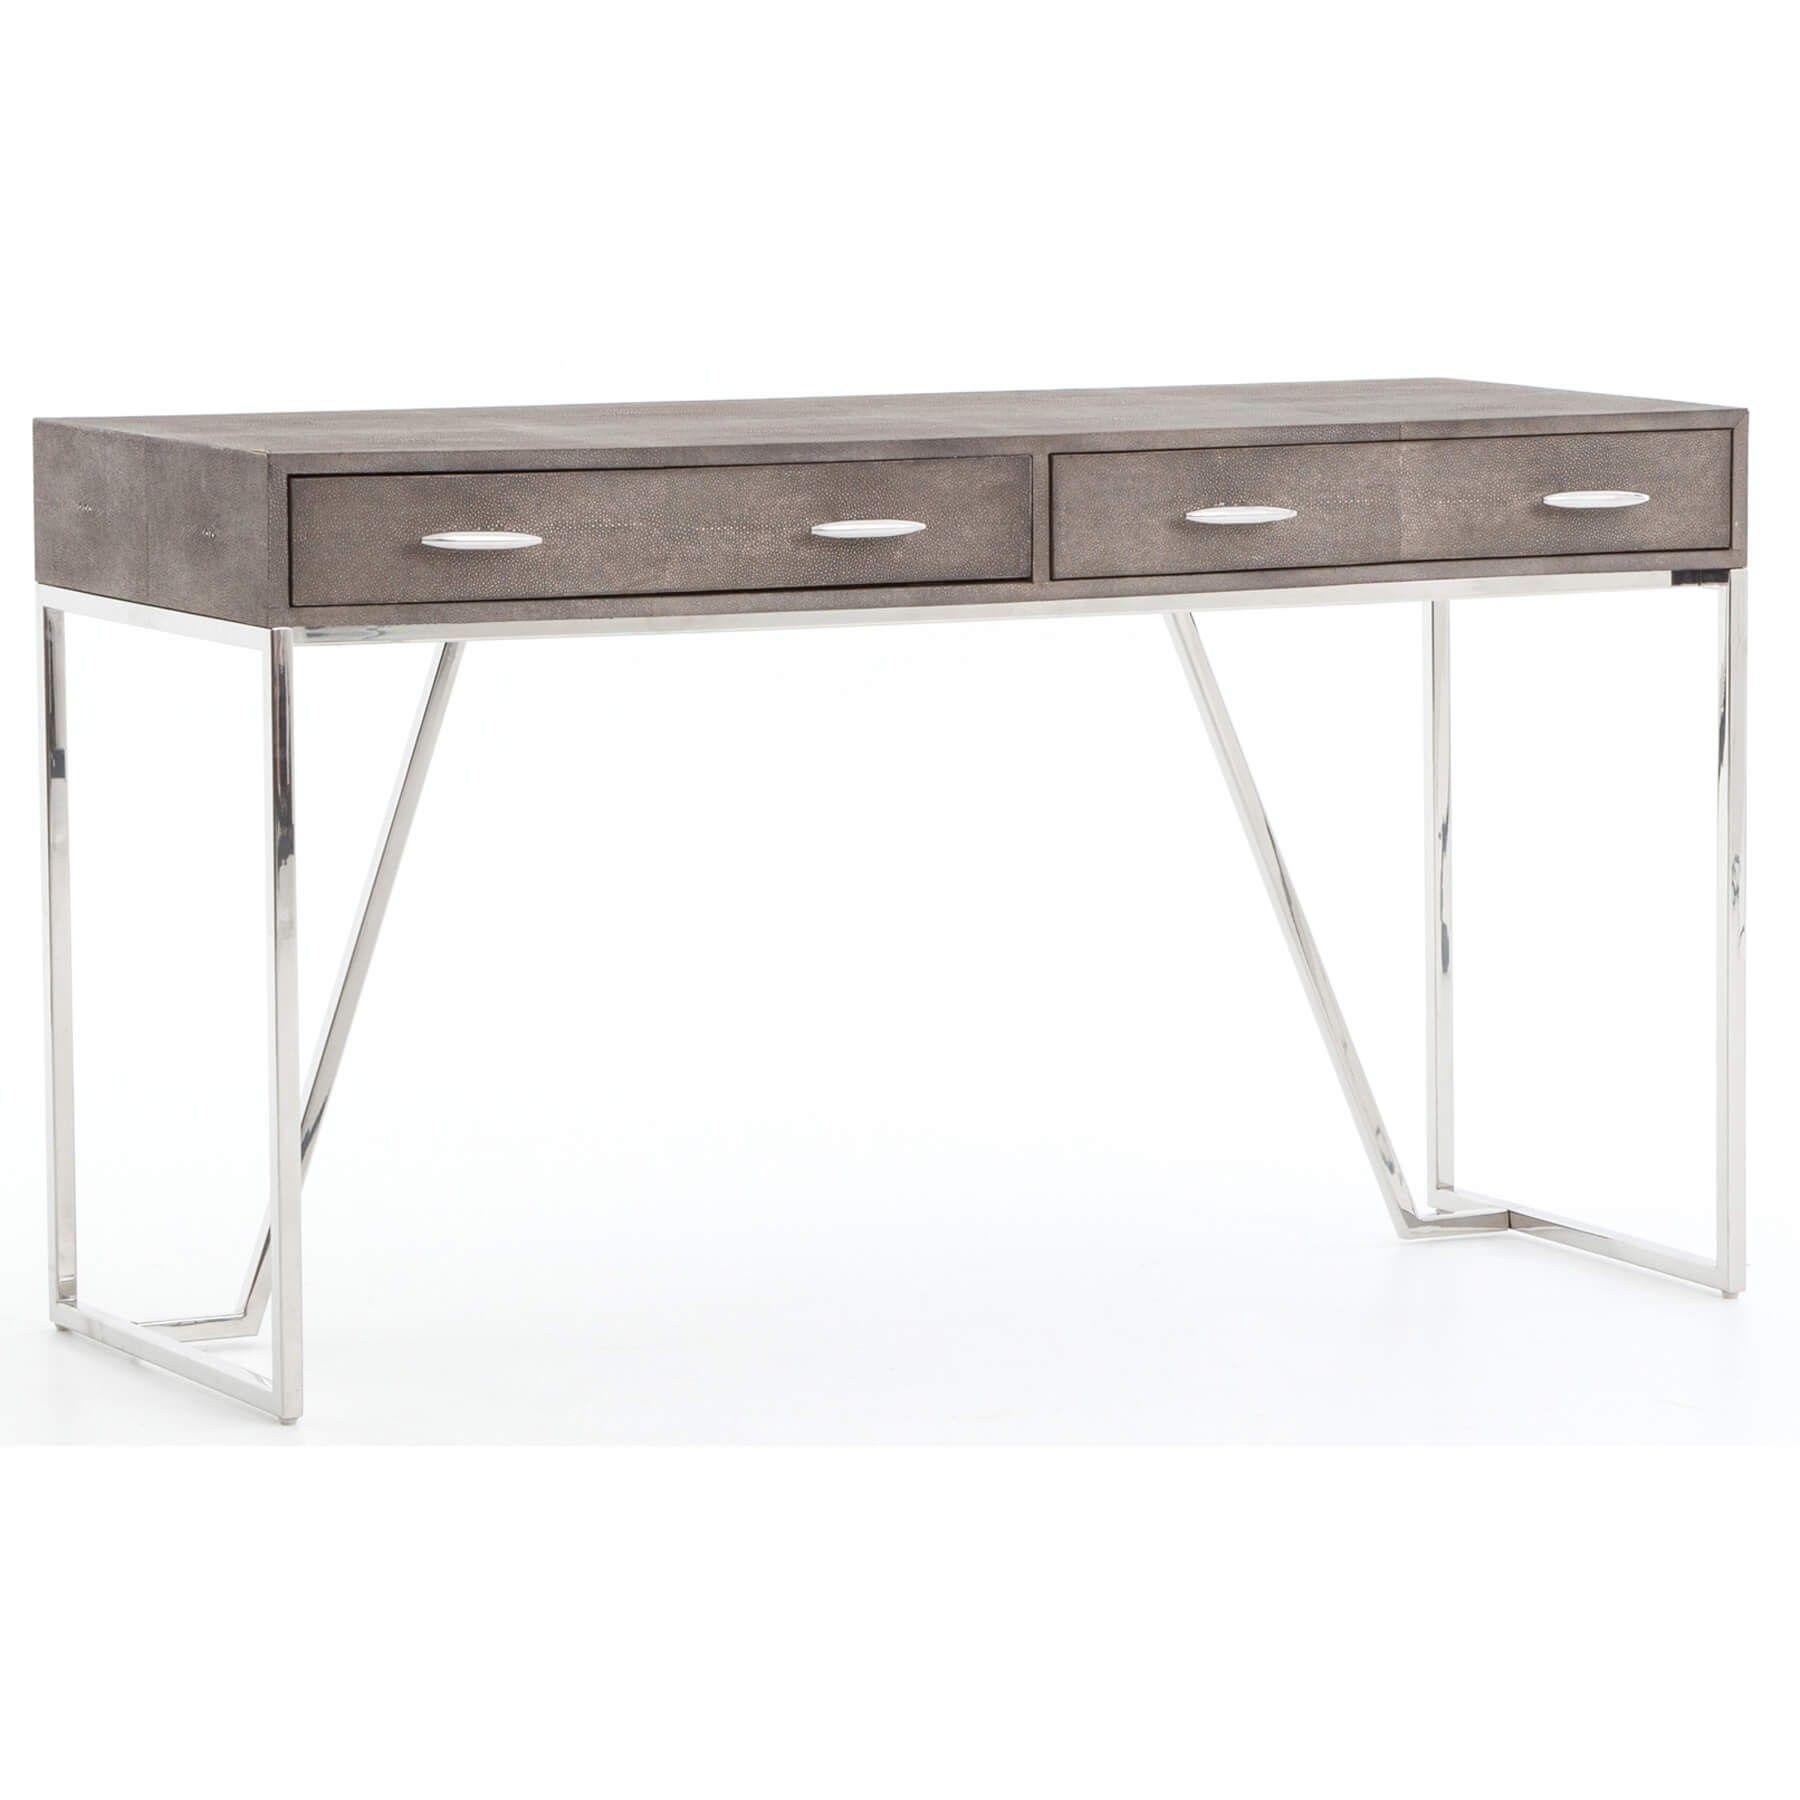 Shagreen Desk Stainless Desks Office Furniture Office